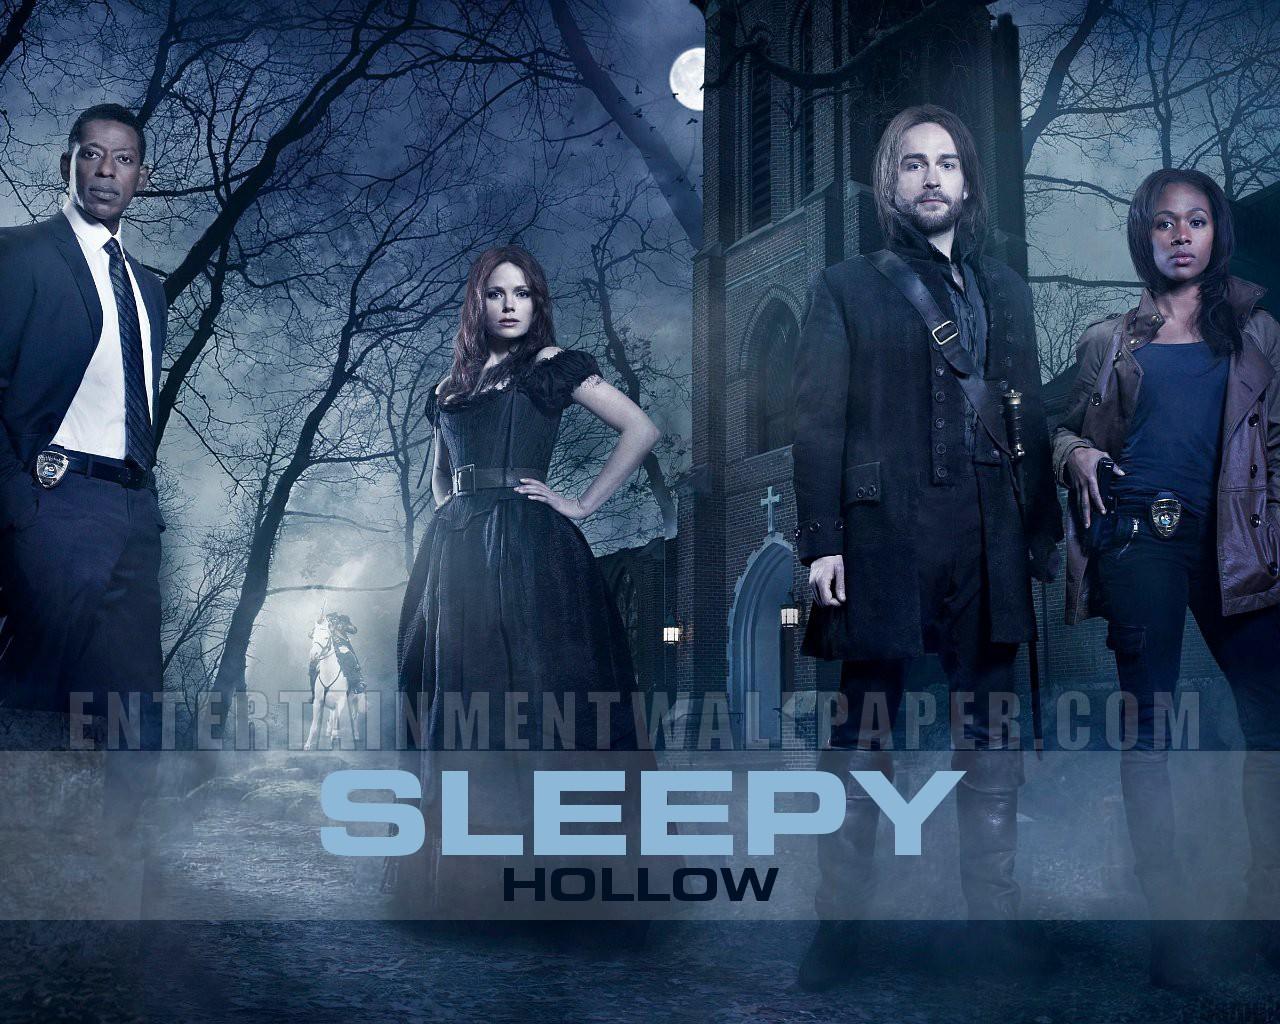 sleepy hollow tv show wallpaper - photo #17